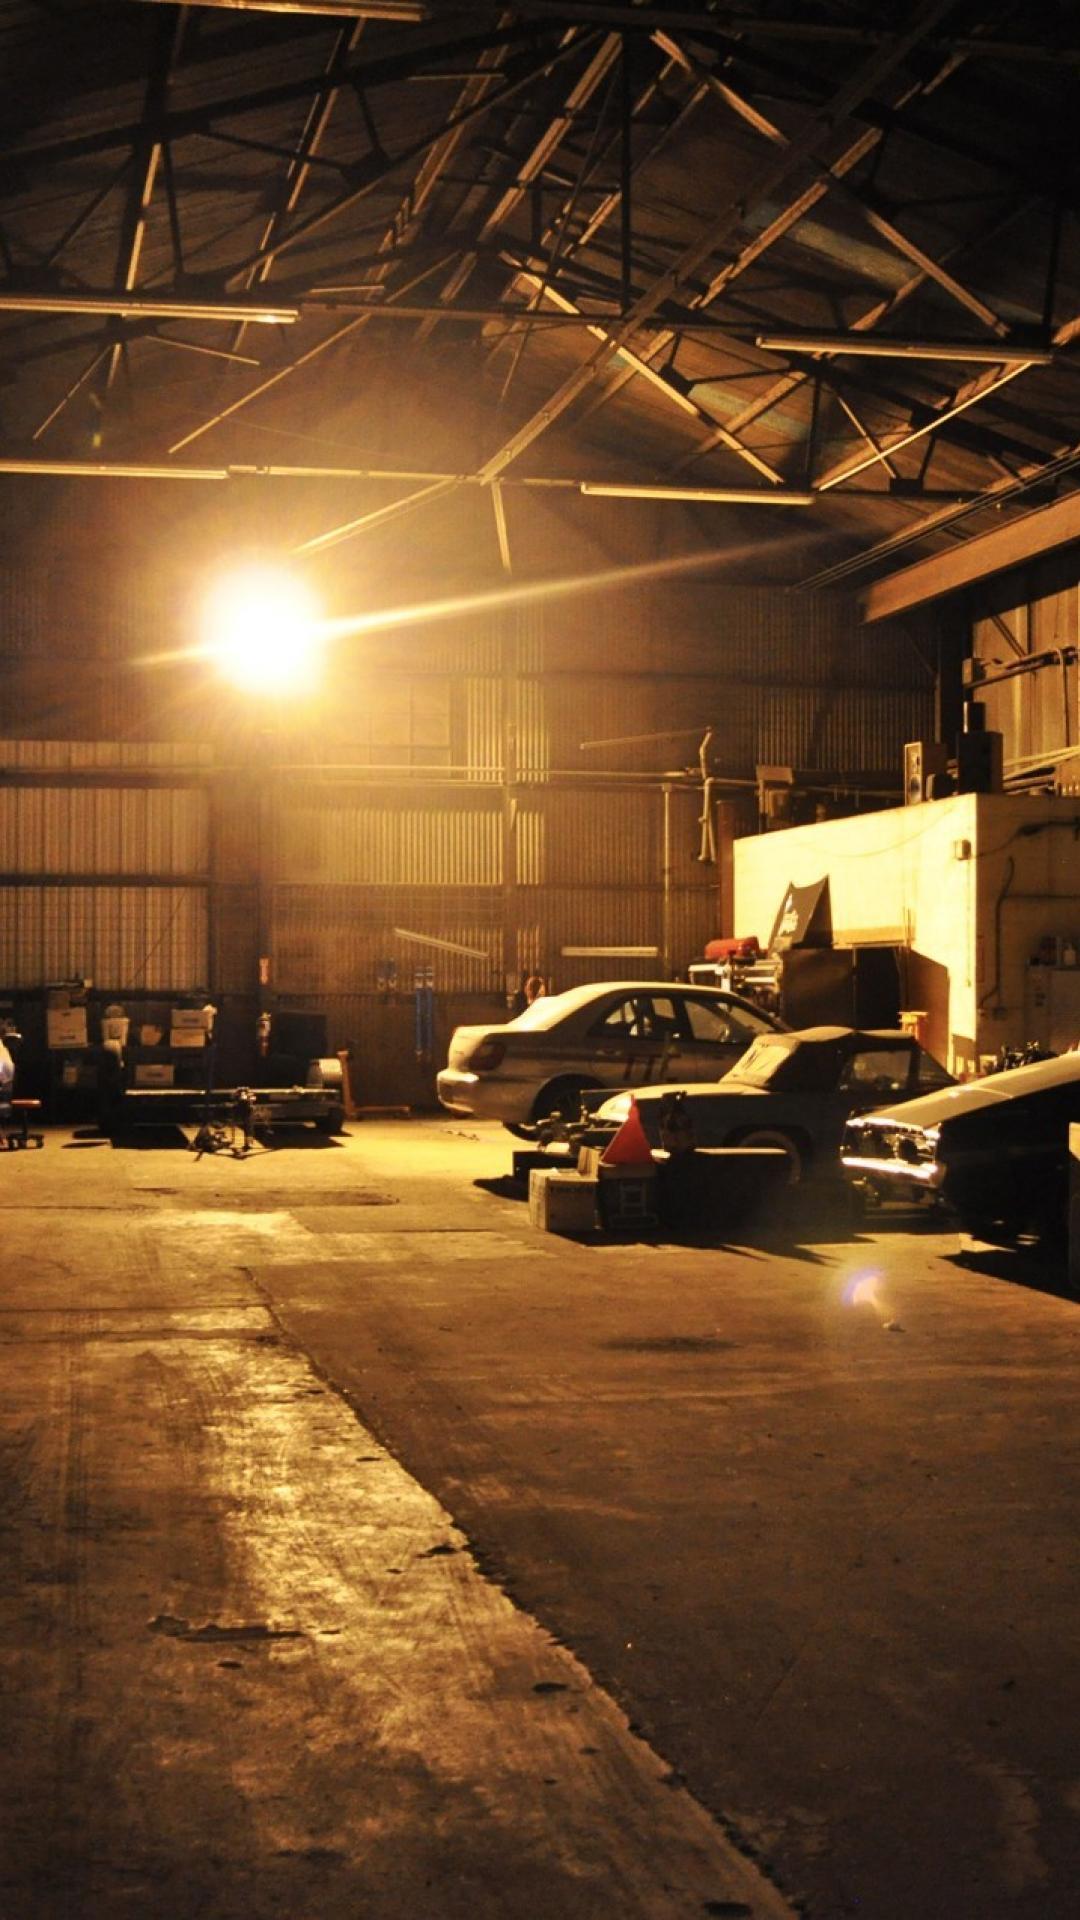 Car Workshop Wallpapers Garage Wallpapers Wallpaper Cave